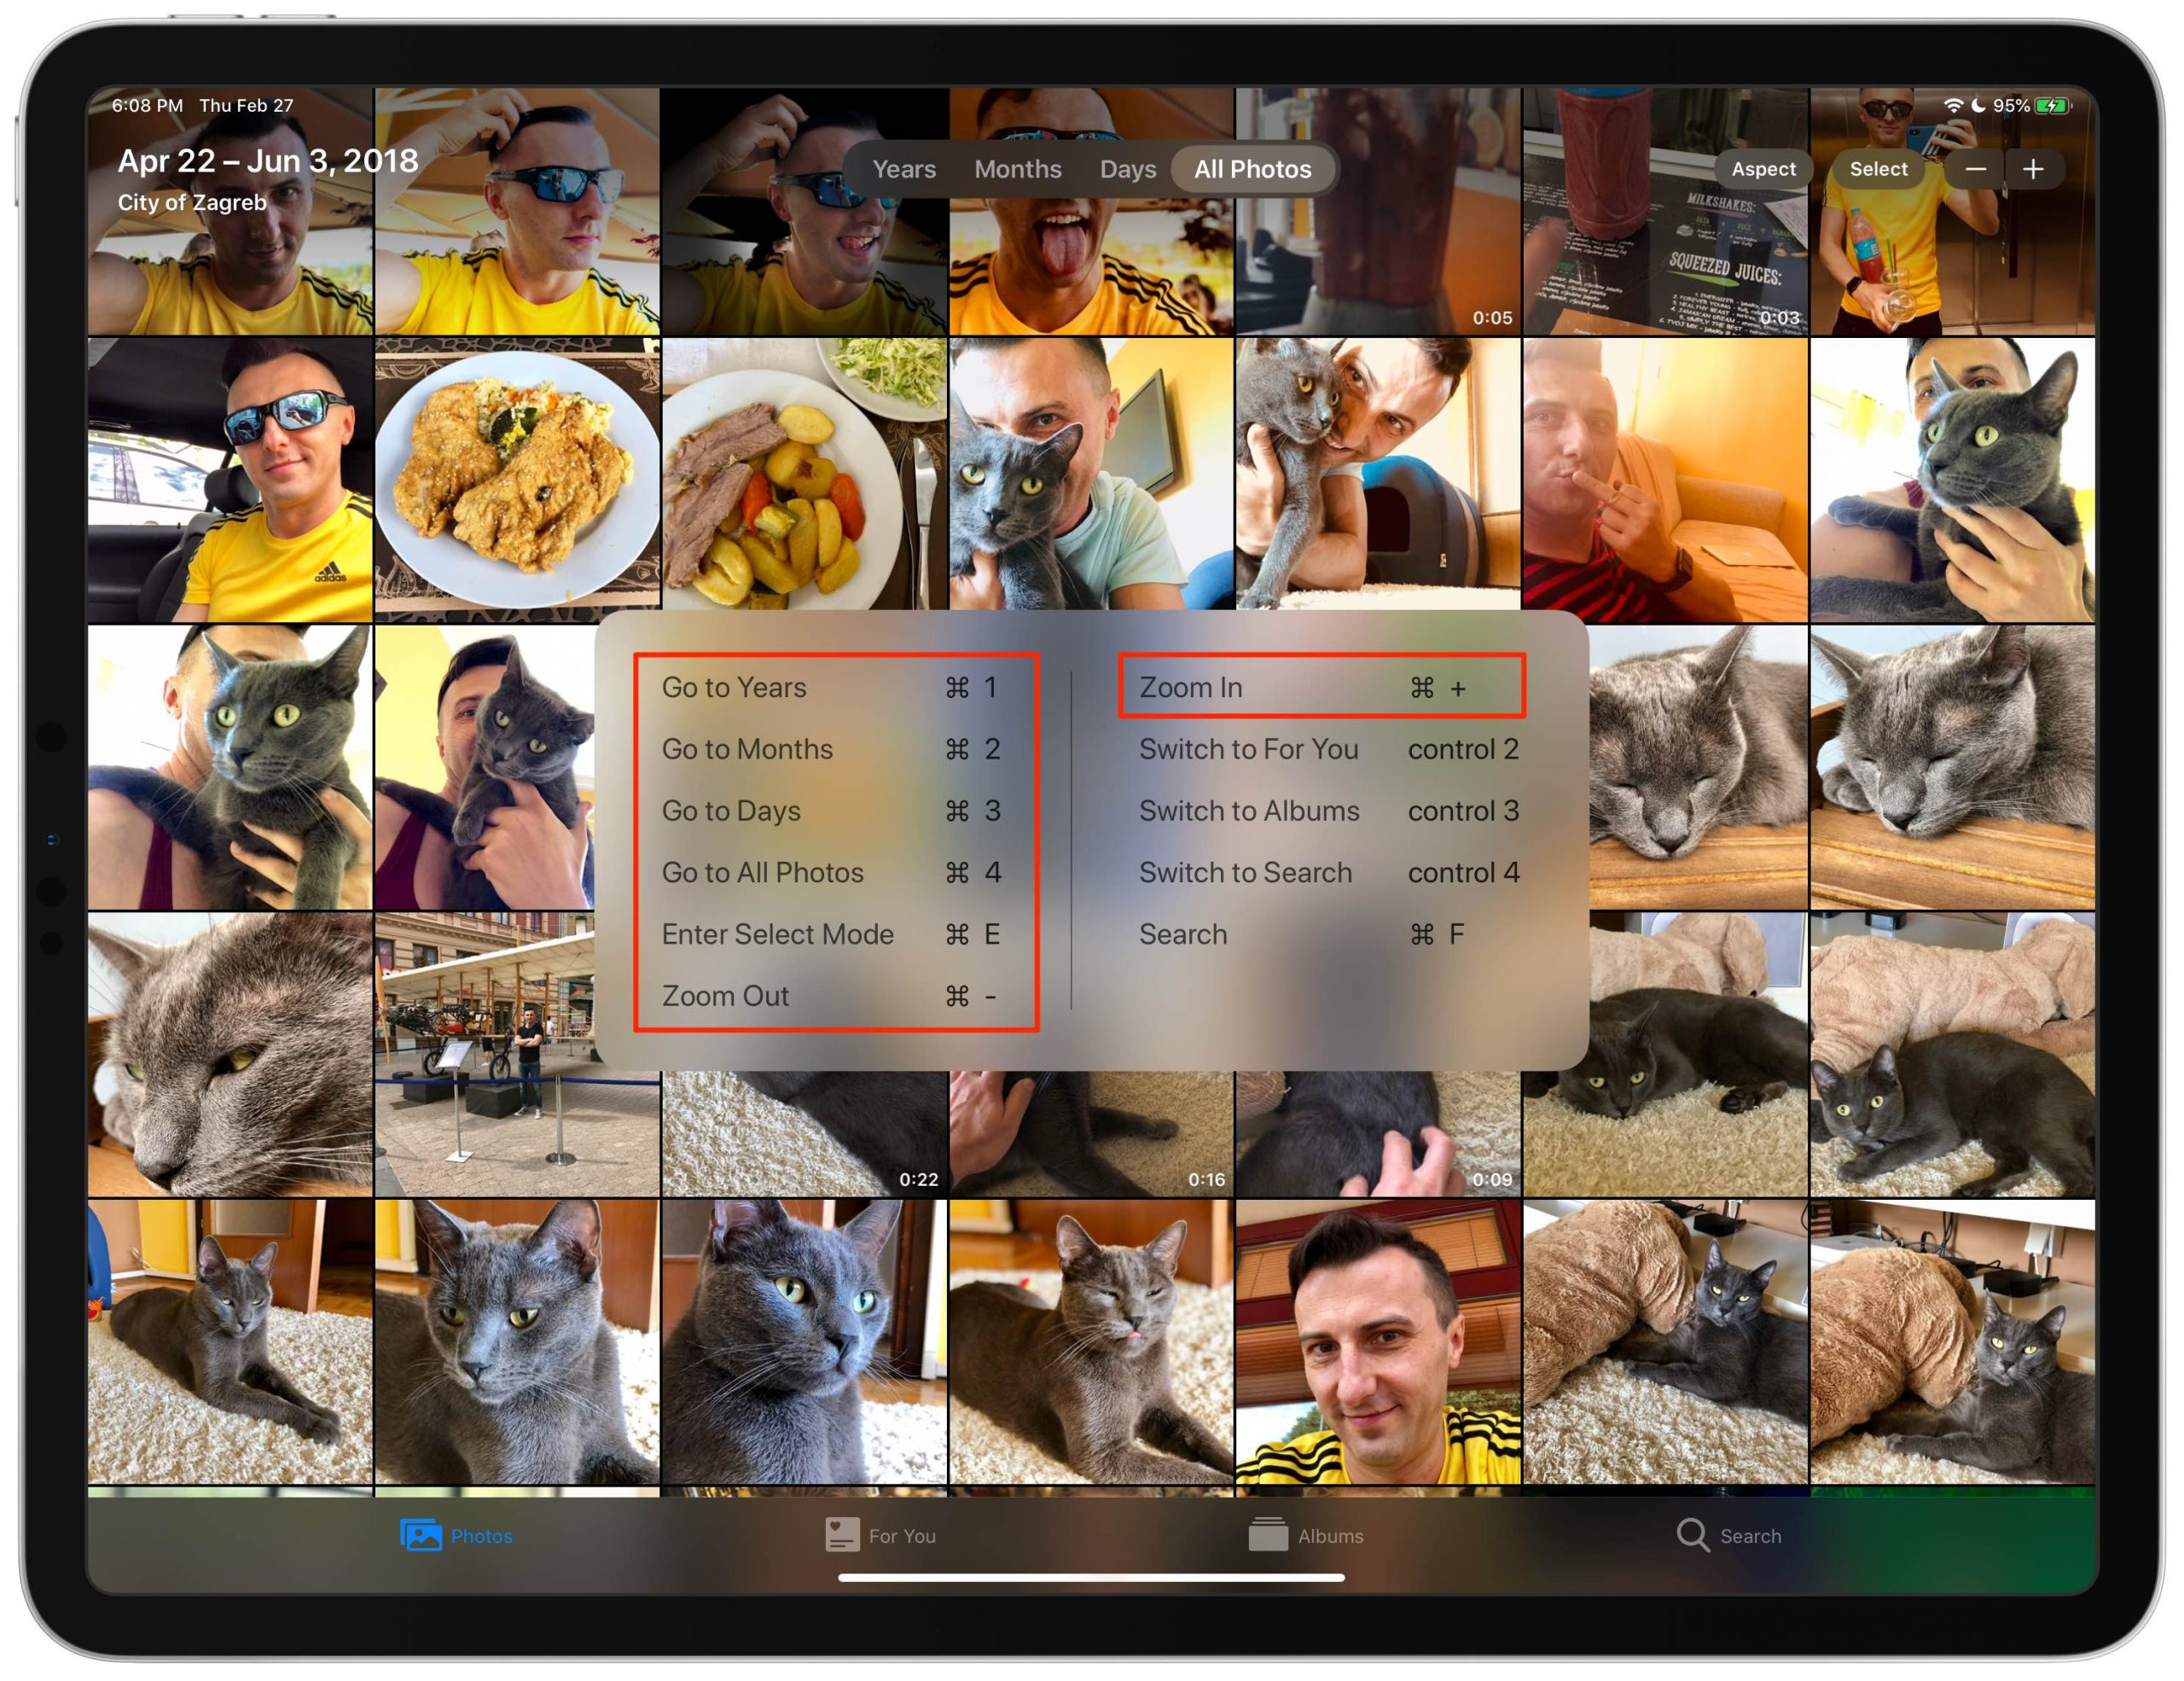 Accesos directos Fotos iOS iPhone iPad